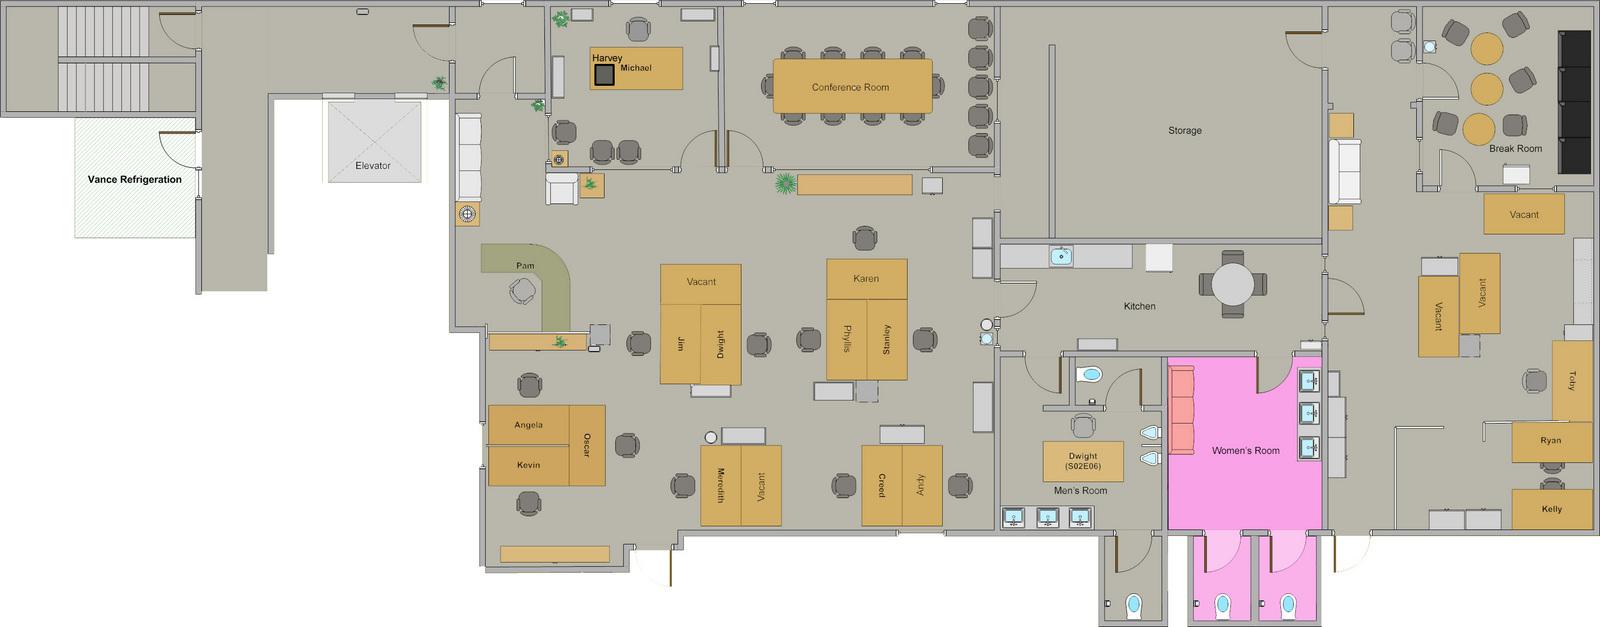 the office floorplan the weblog 2 3